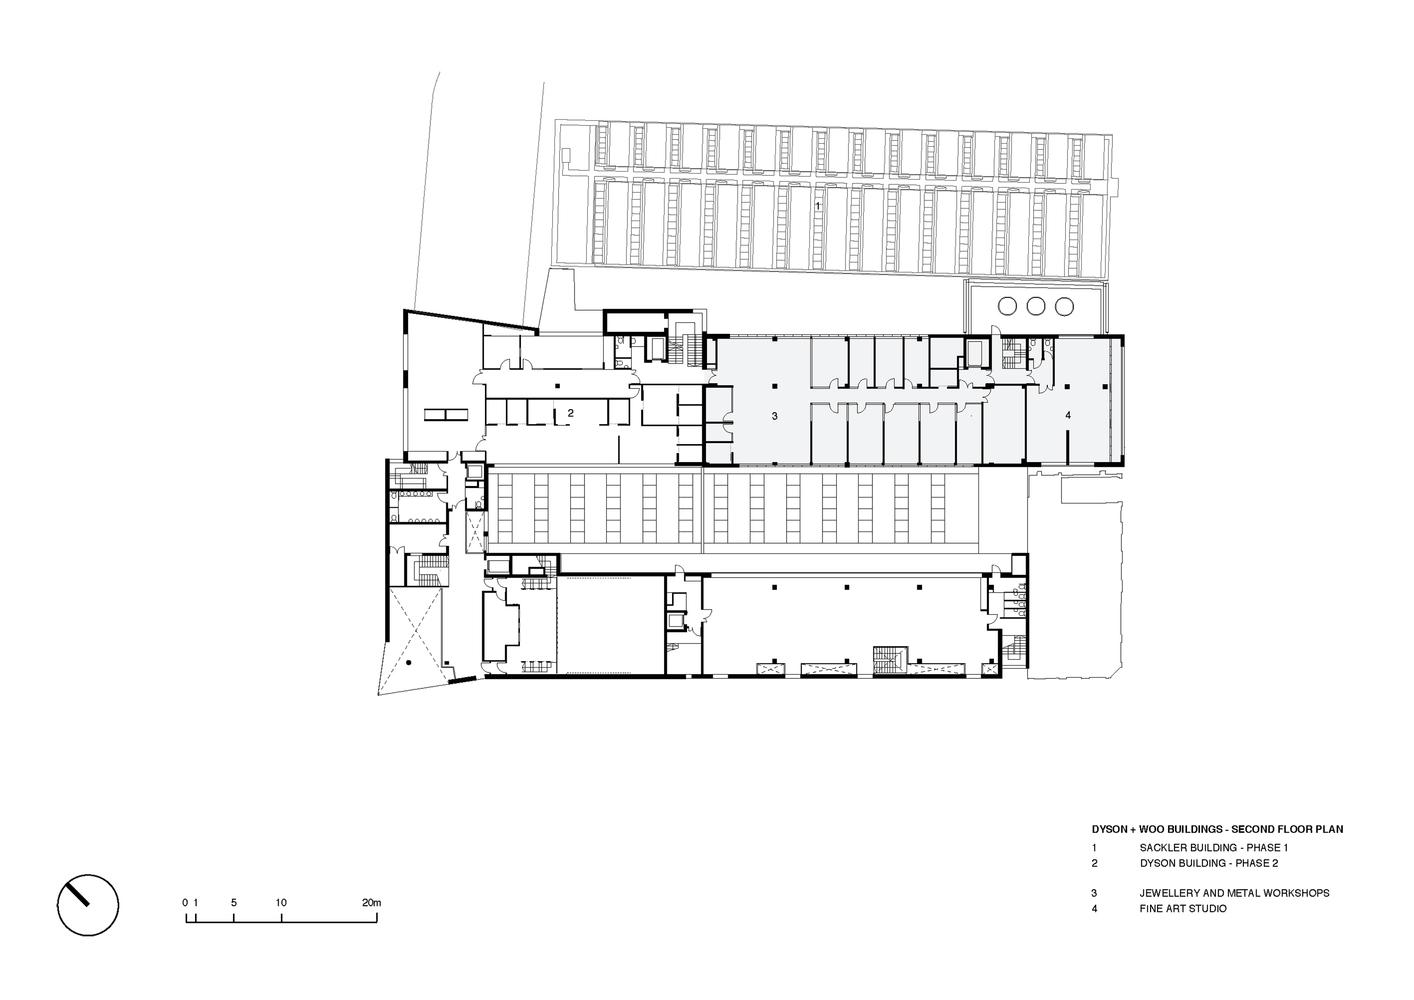 Royal College Of Art Woo Building